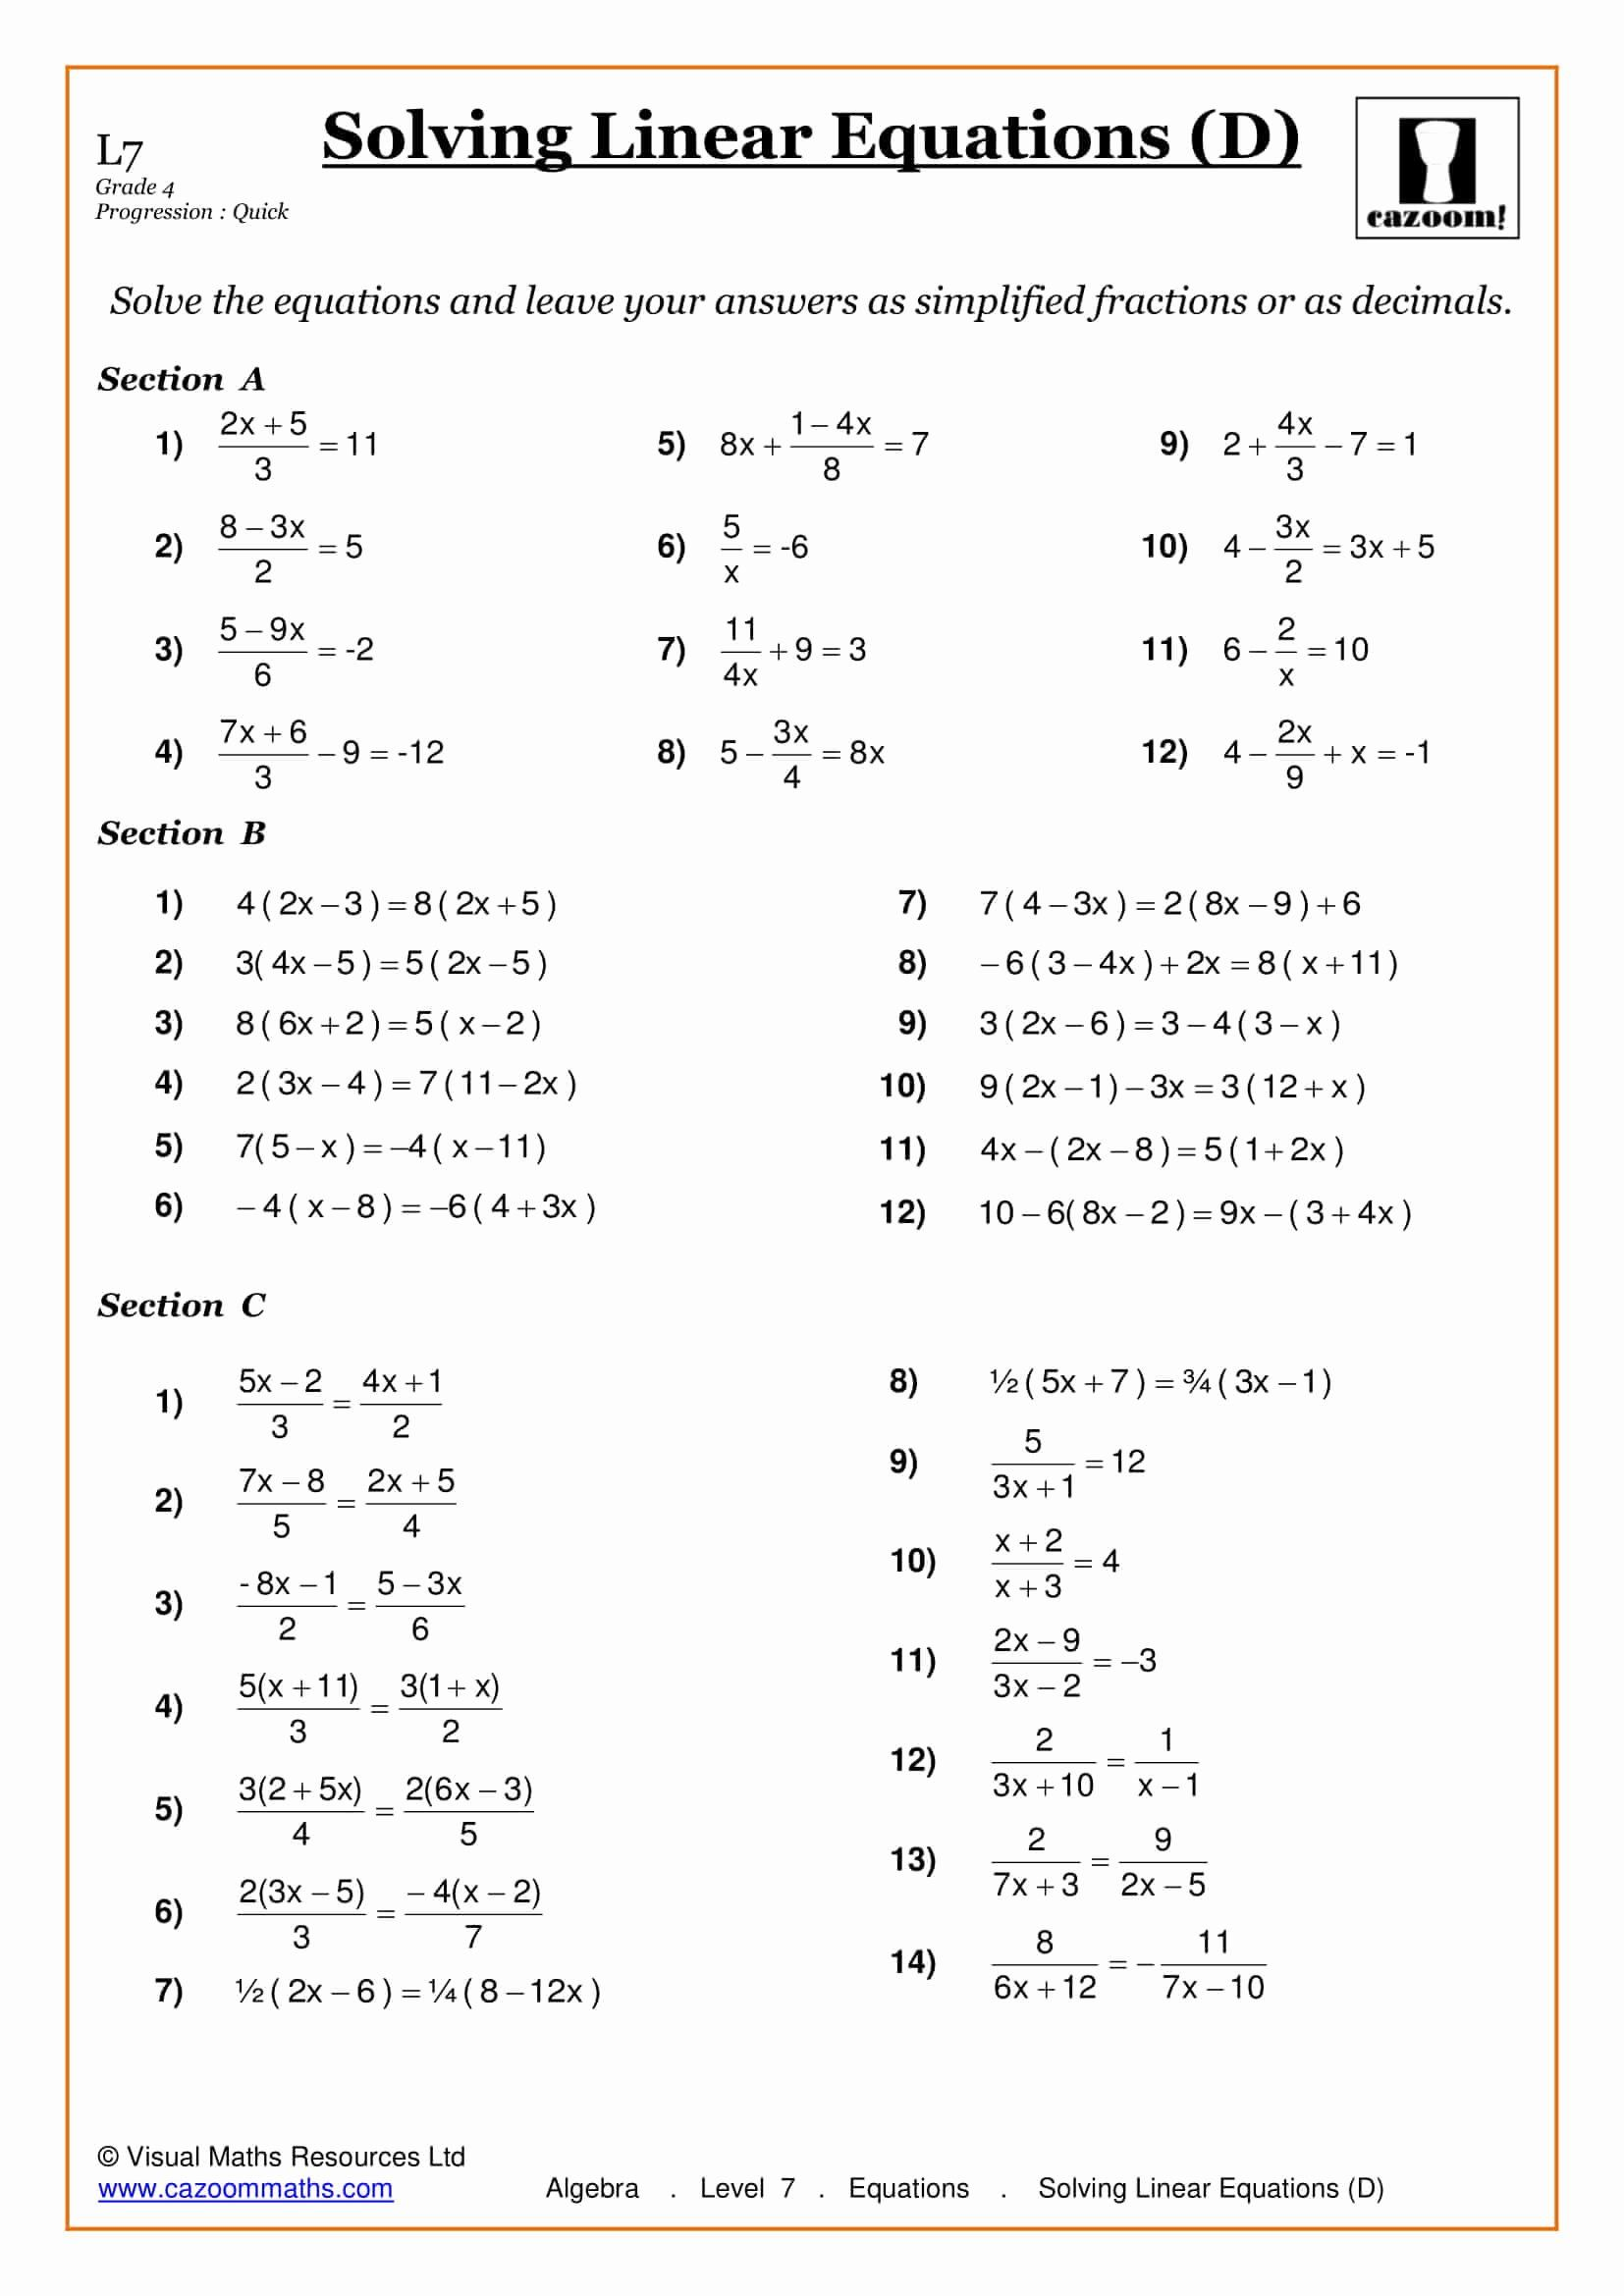 Pin By Jigar Ankleshwaria On Matematika In 2020 Algebra Worksheets Solving Equations Pre Algebra Worksheets